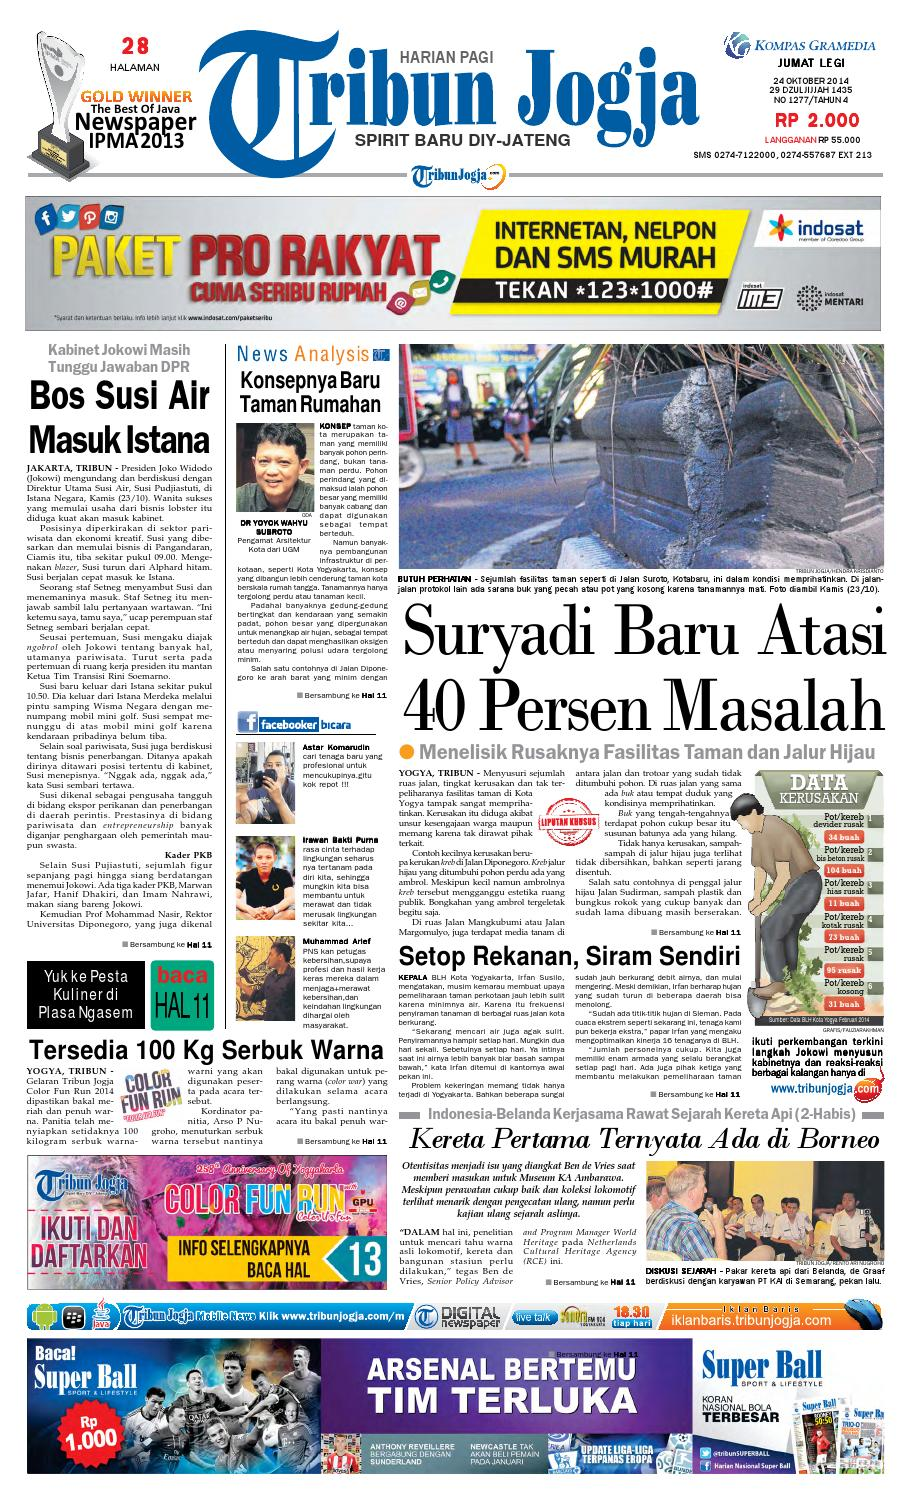 Tribunjogja 24 10 2014 By Tribun Jogja Issuu Produk Ukm Bumn Rasa Dewa Sari Buah Mbing 250ml Jus Free Ongkir Depok Ampamp Jakarta